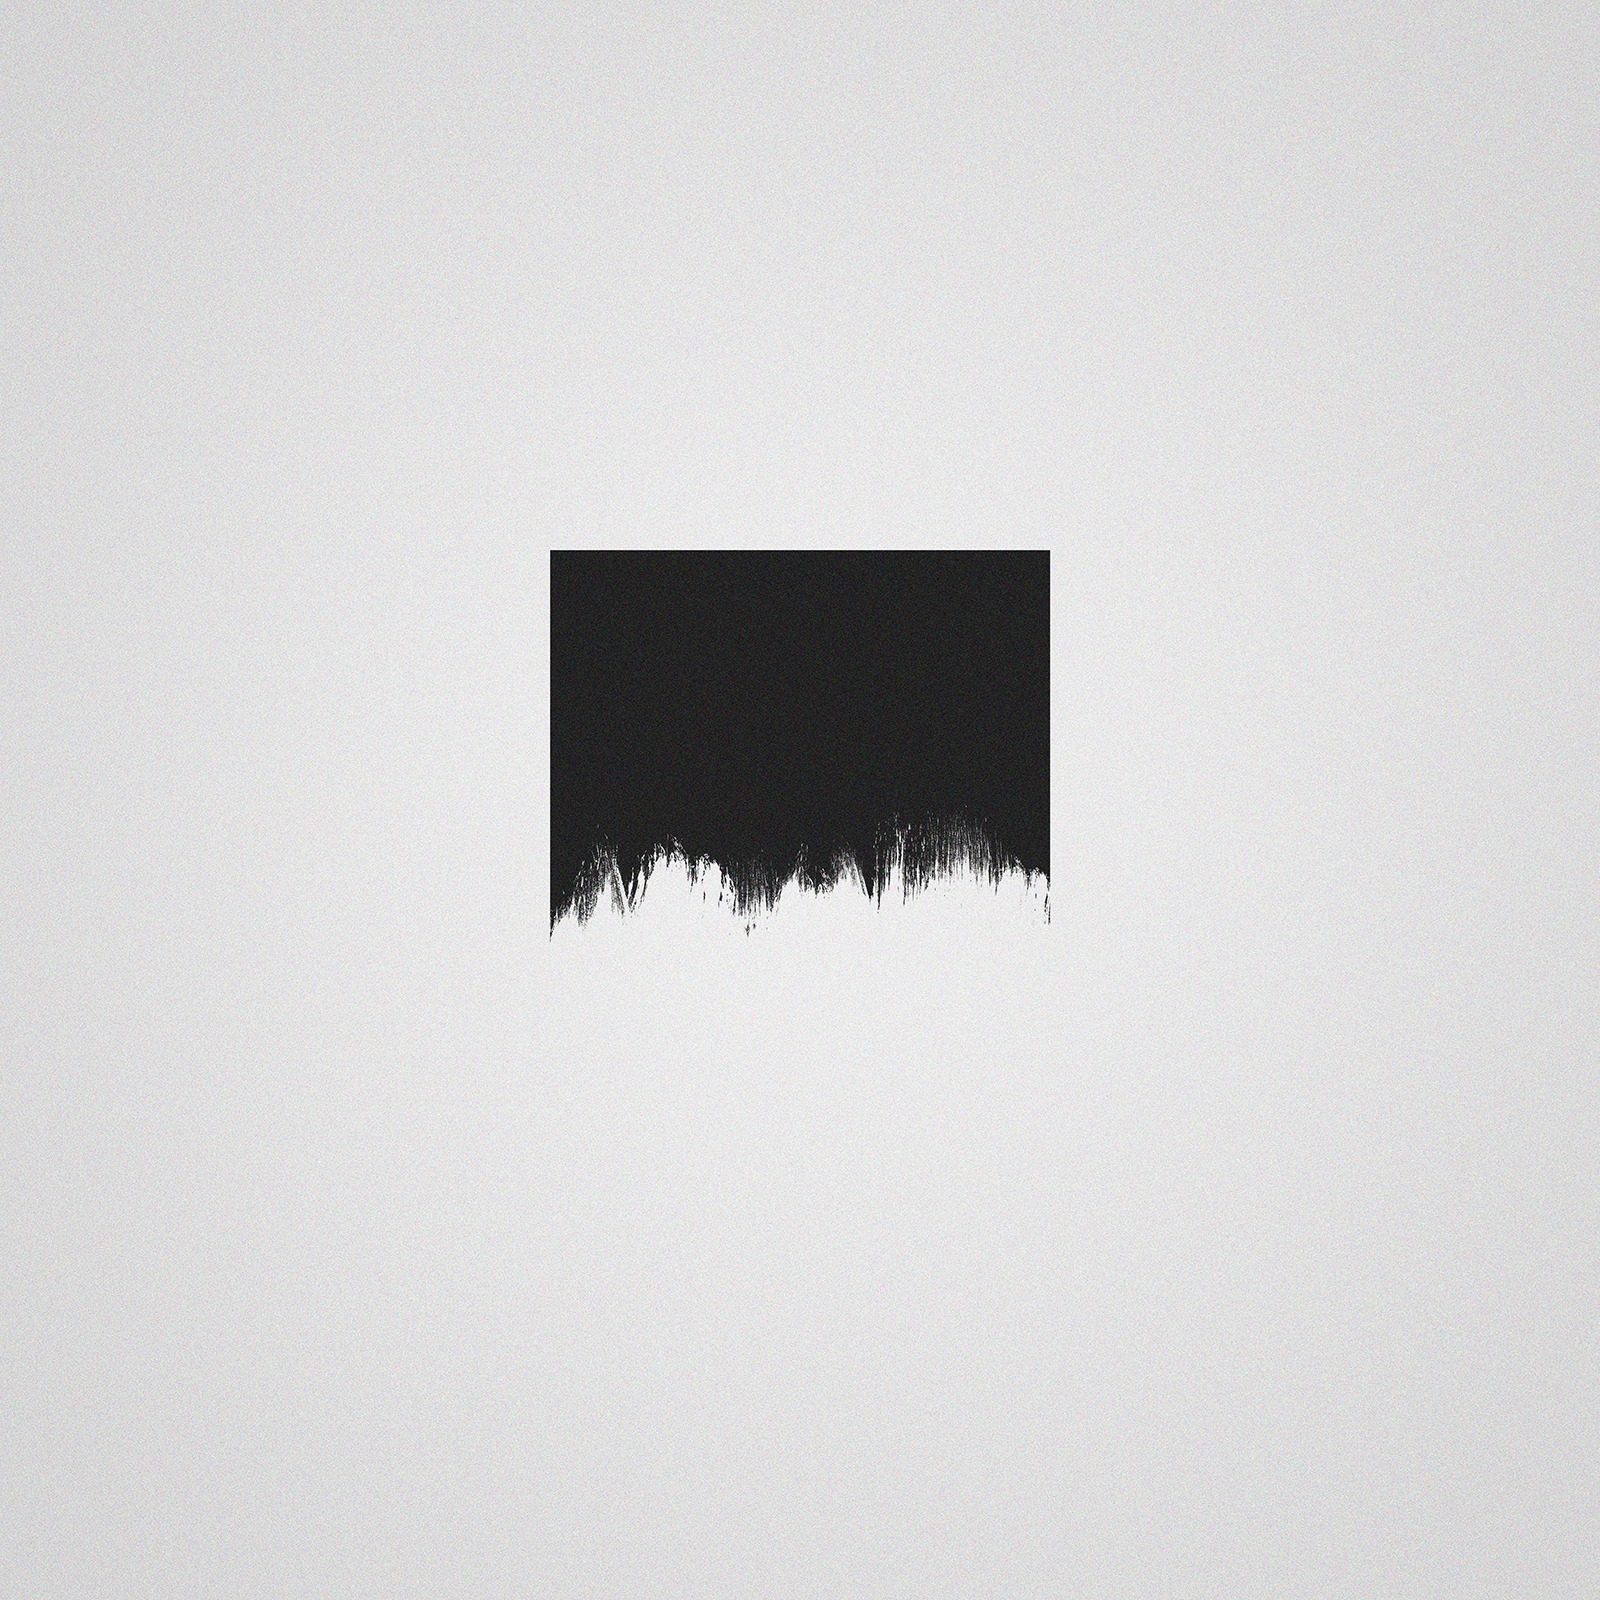 Unfinished - Art, artwork, abstract - studiominimalista   ello